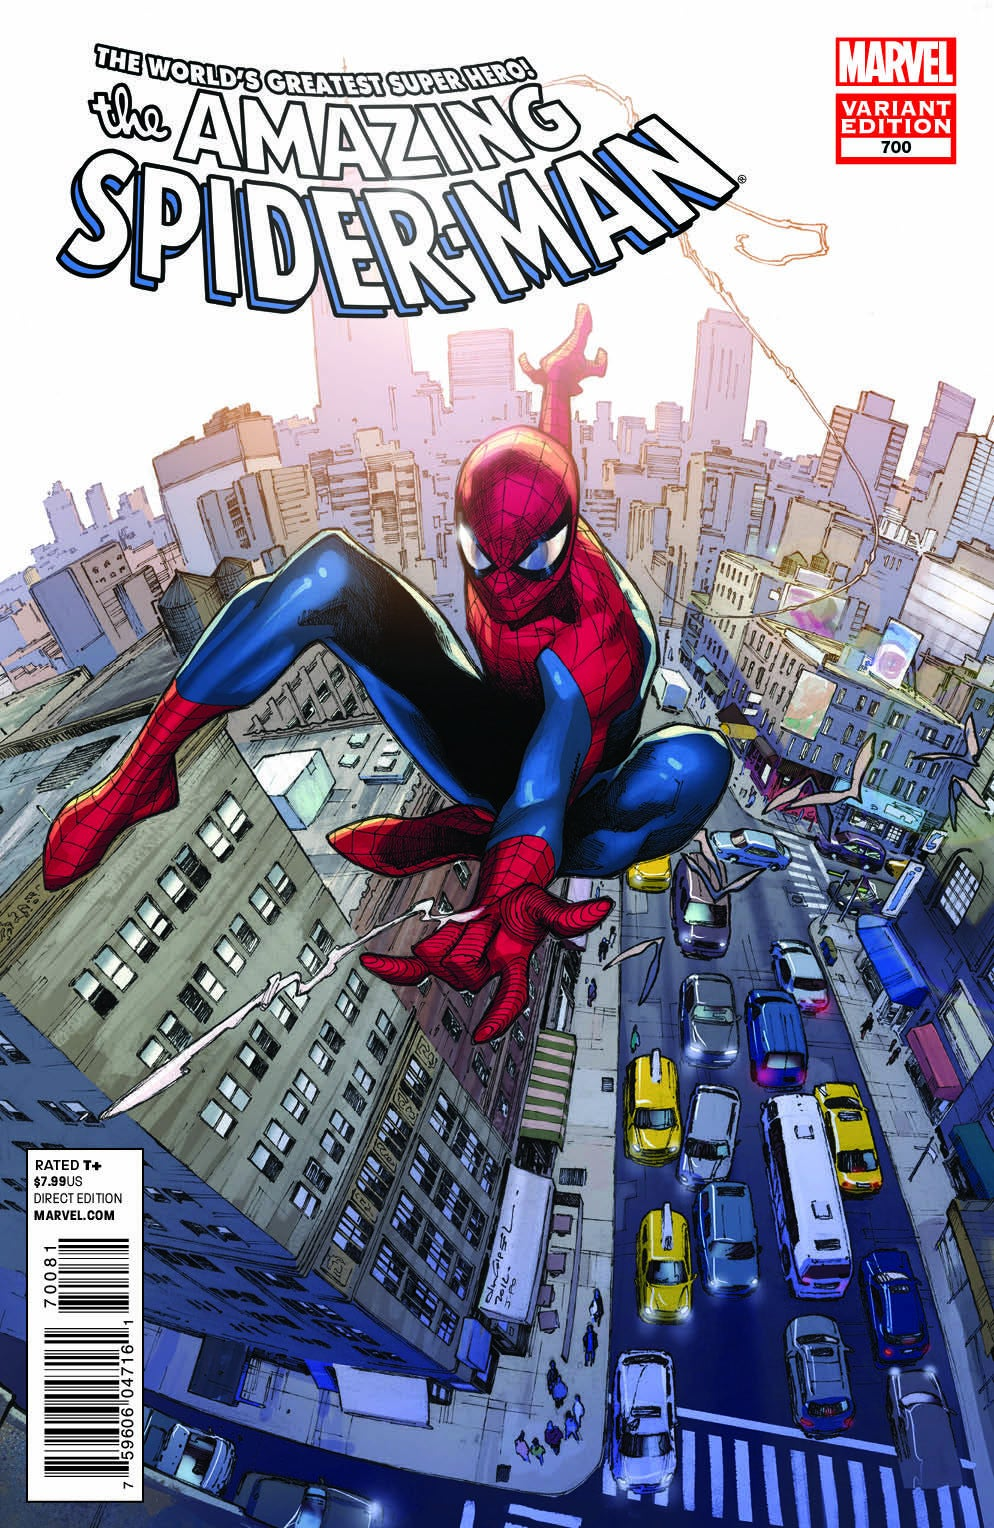 Amazing Spider-Man Comic Book Key Issues & Values - Comics